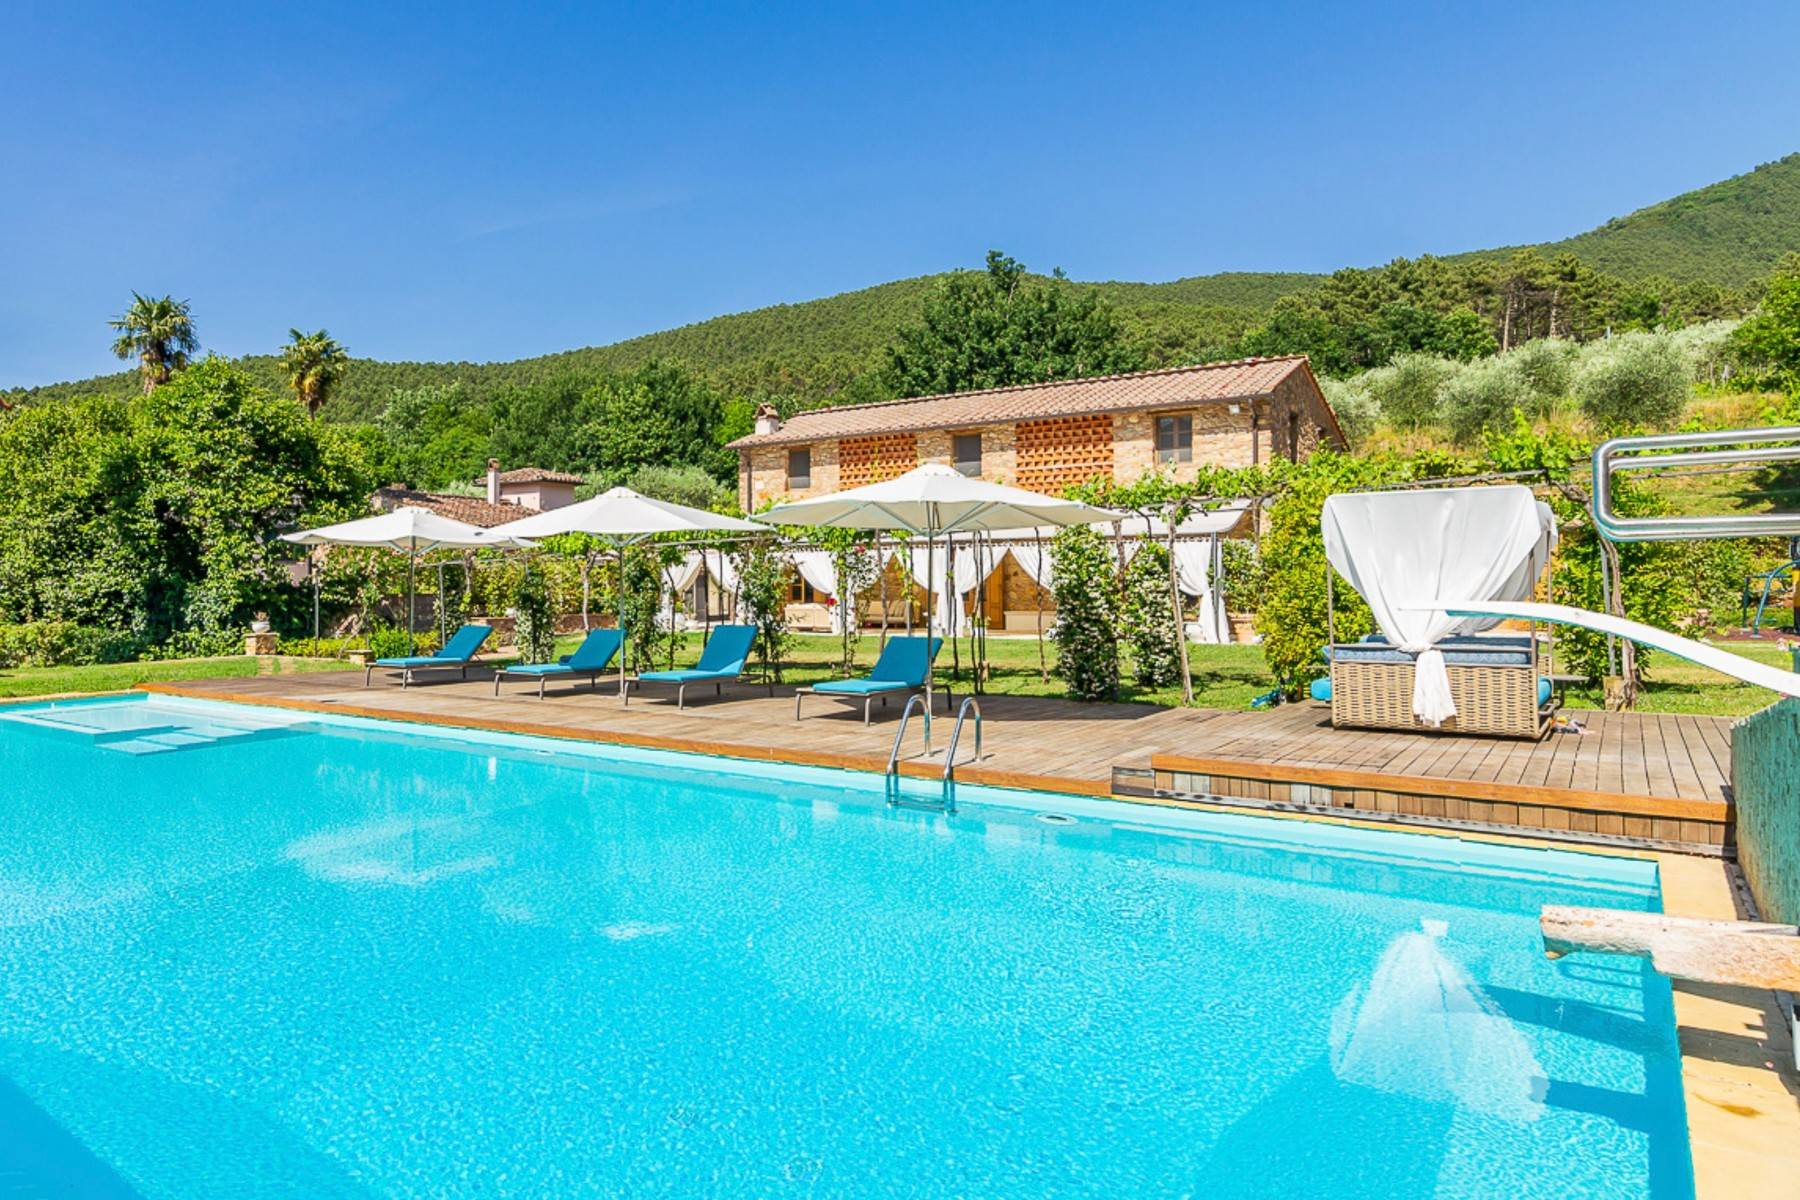 Villa in Vendita a Lucca: 5 locali, 1130 mq - Foto 4